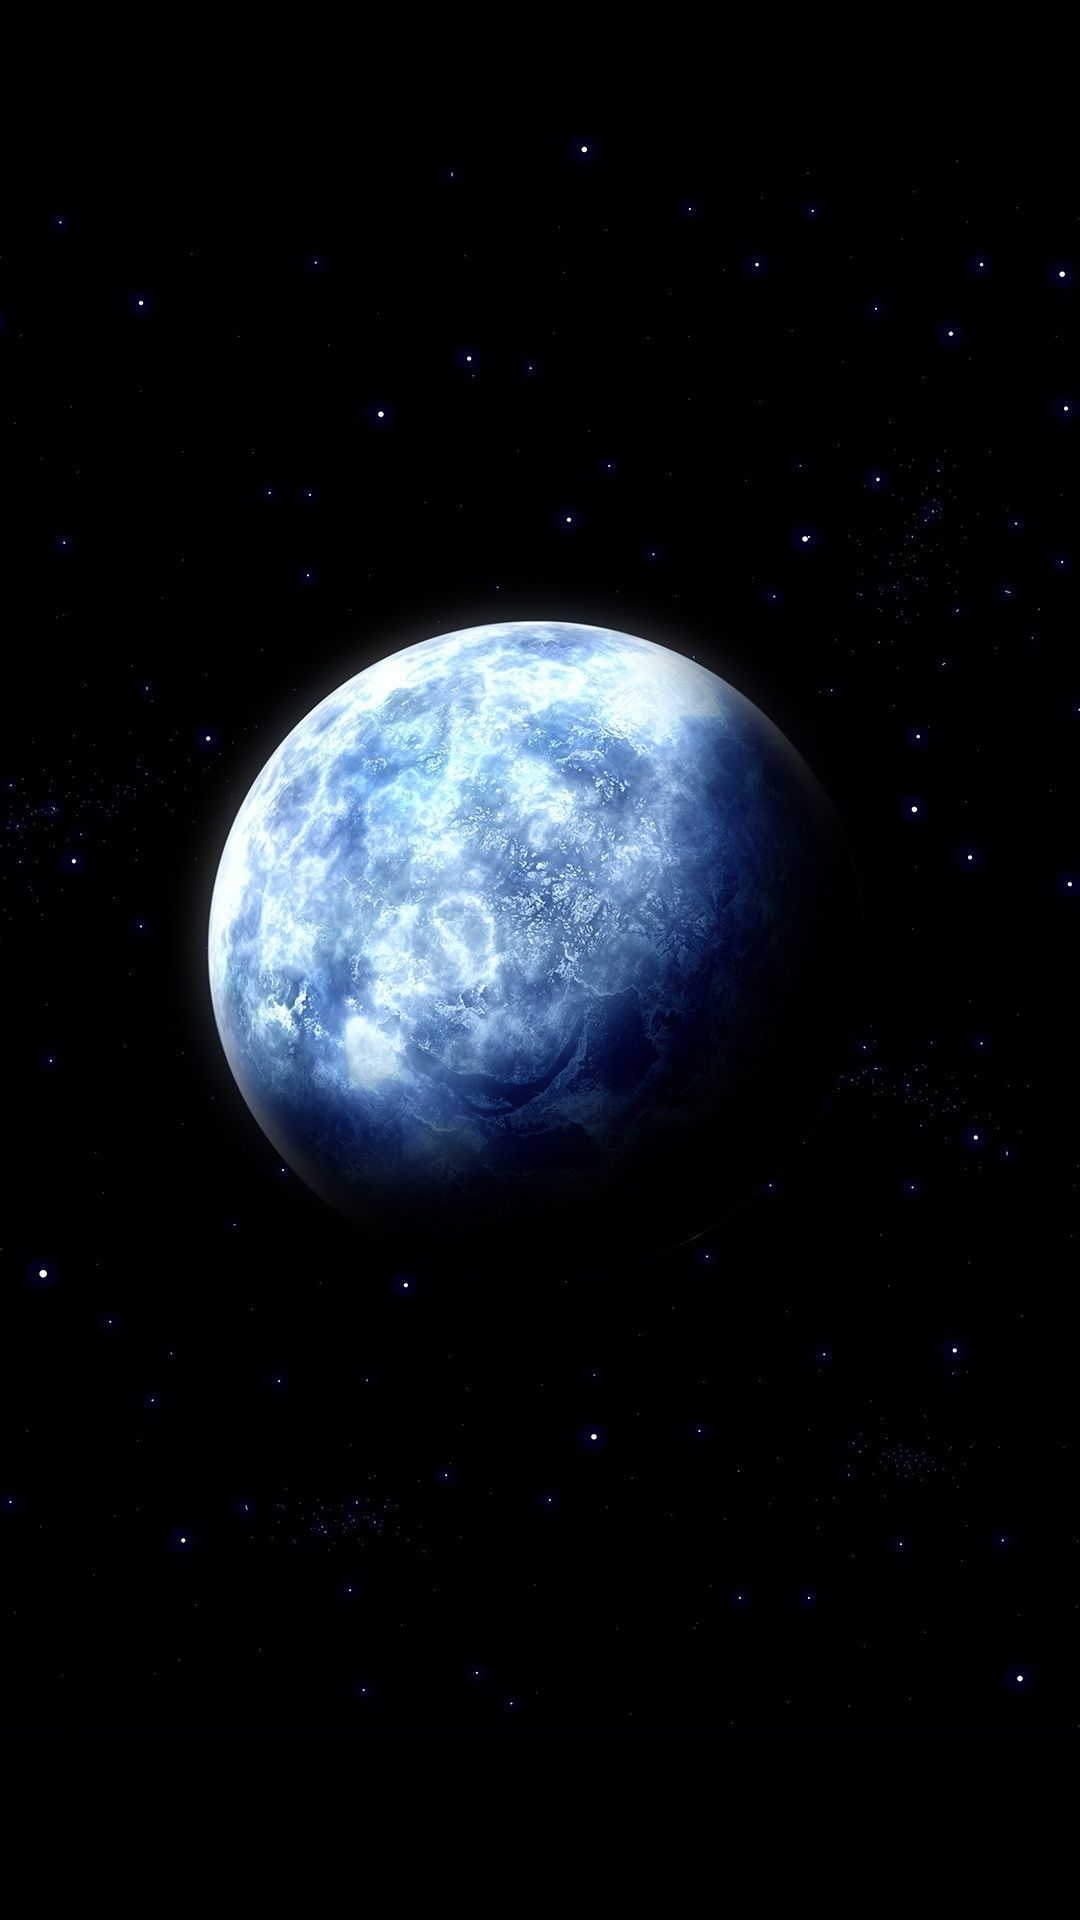 Outer Space Atmosphere Planet Astronomical Object Universe Astronomy Gezegenler Arka Plan Resimleri Baski